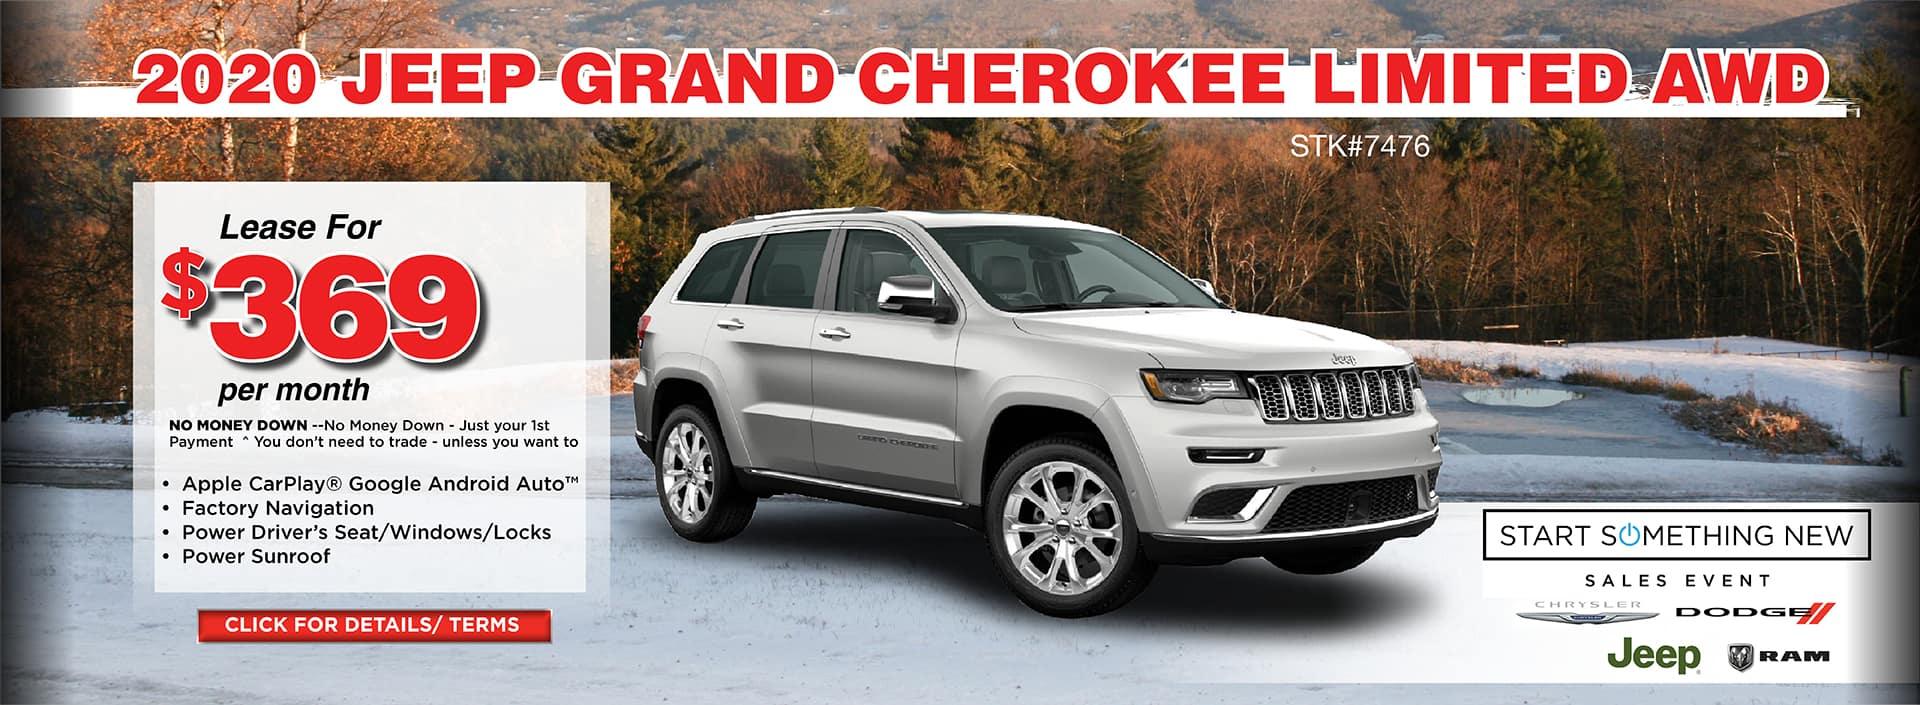 2020 Jeep Grand Cherokee Limited AWD